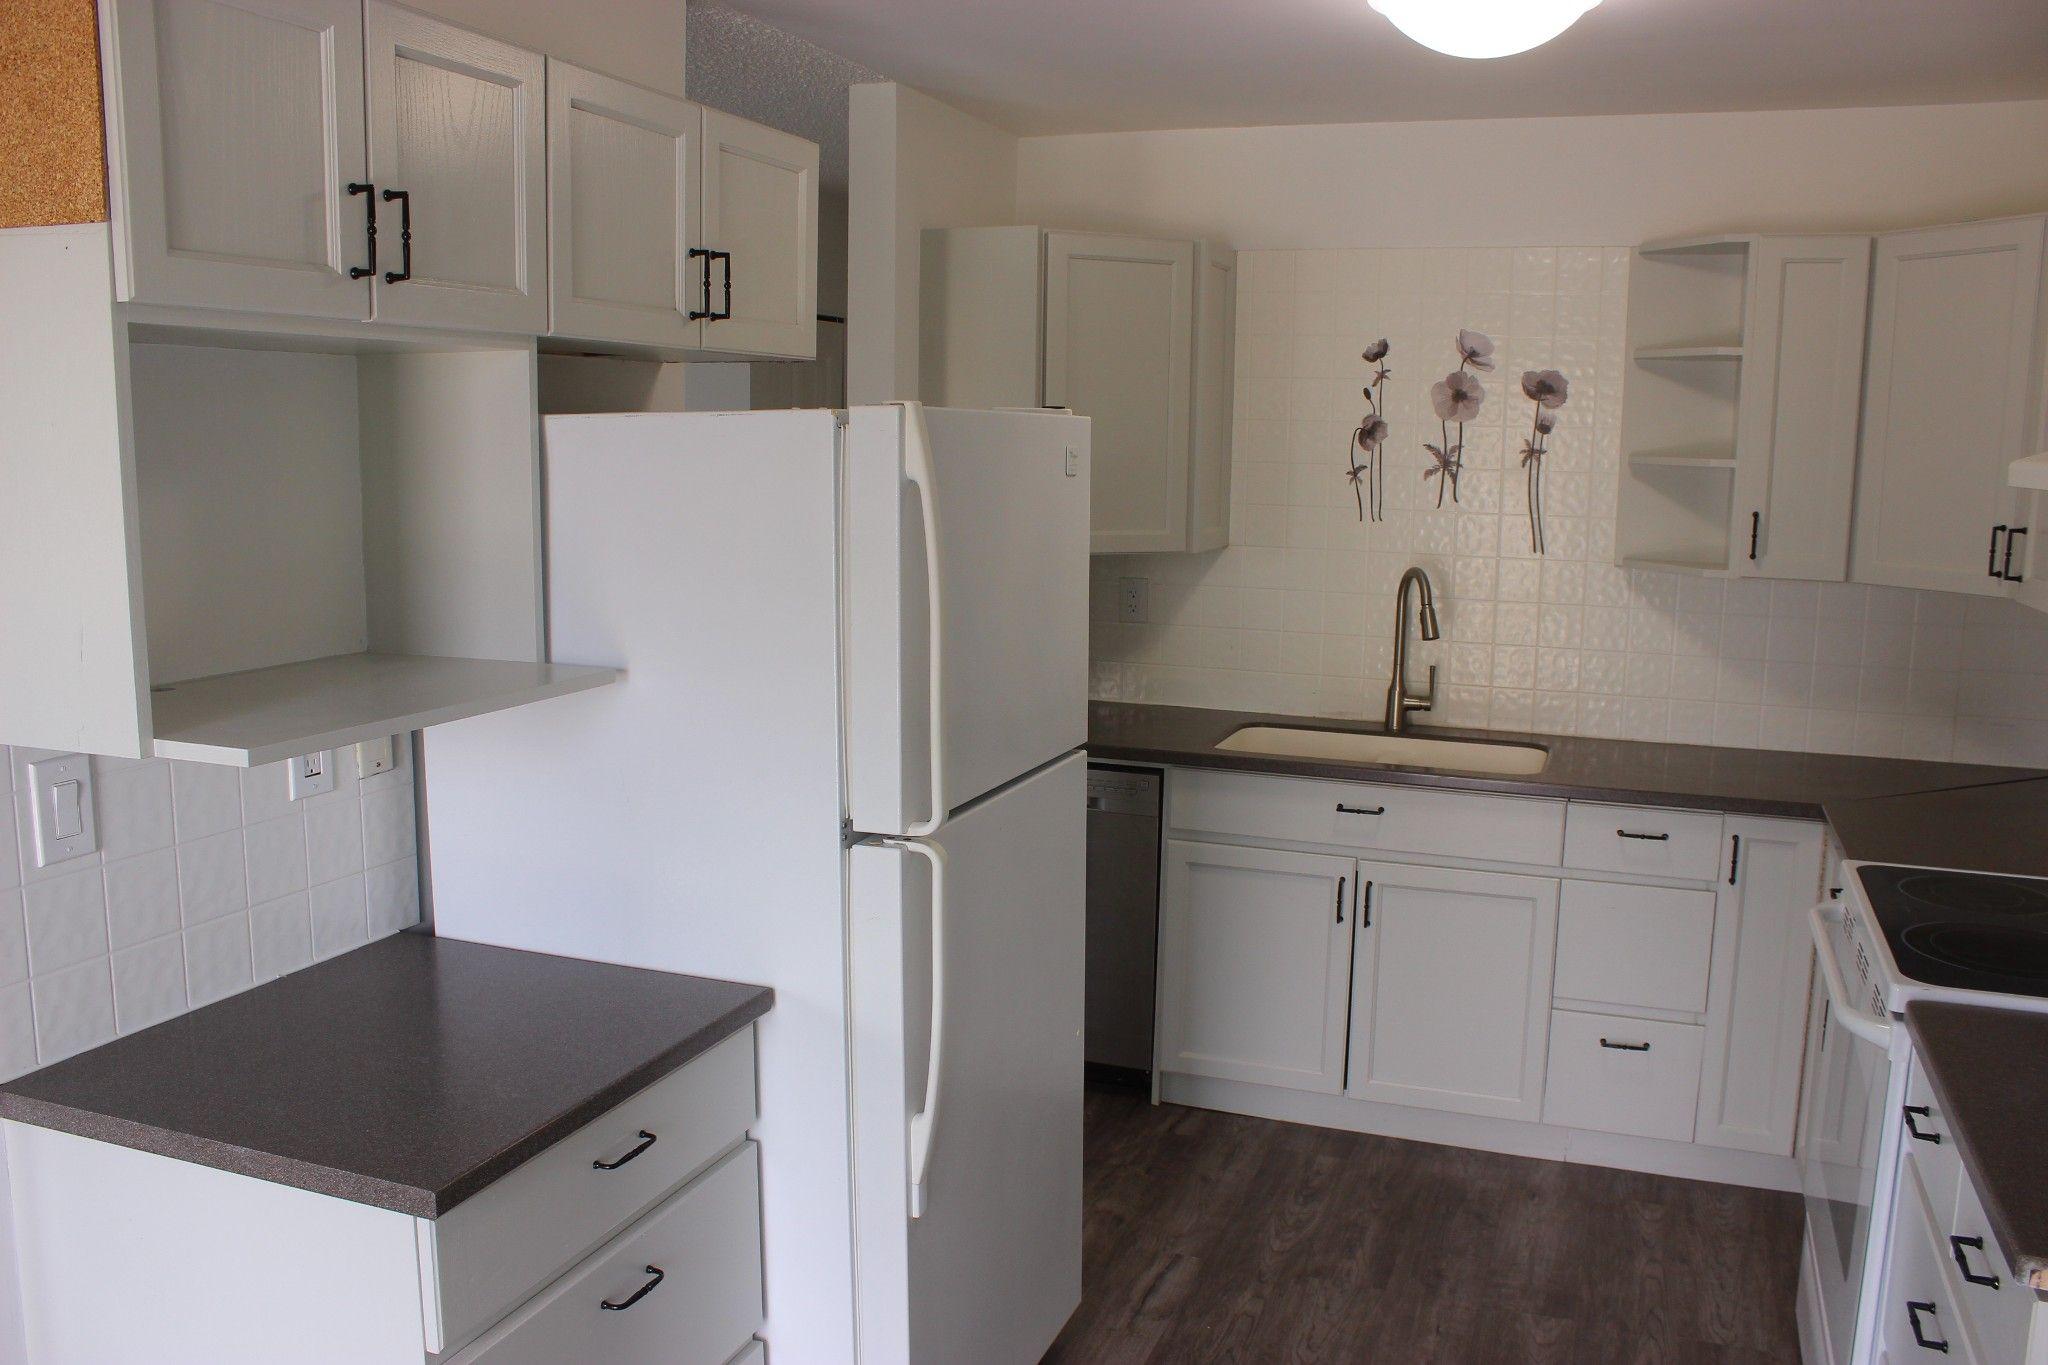 Photo 5: Photos: 317 Waddington Drive in Kamloops: Sahali 1/2 Duplex for sale : MLS®# 161942